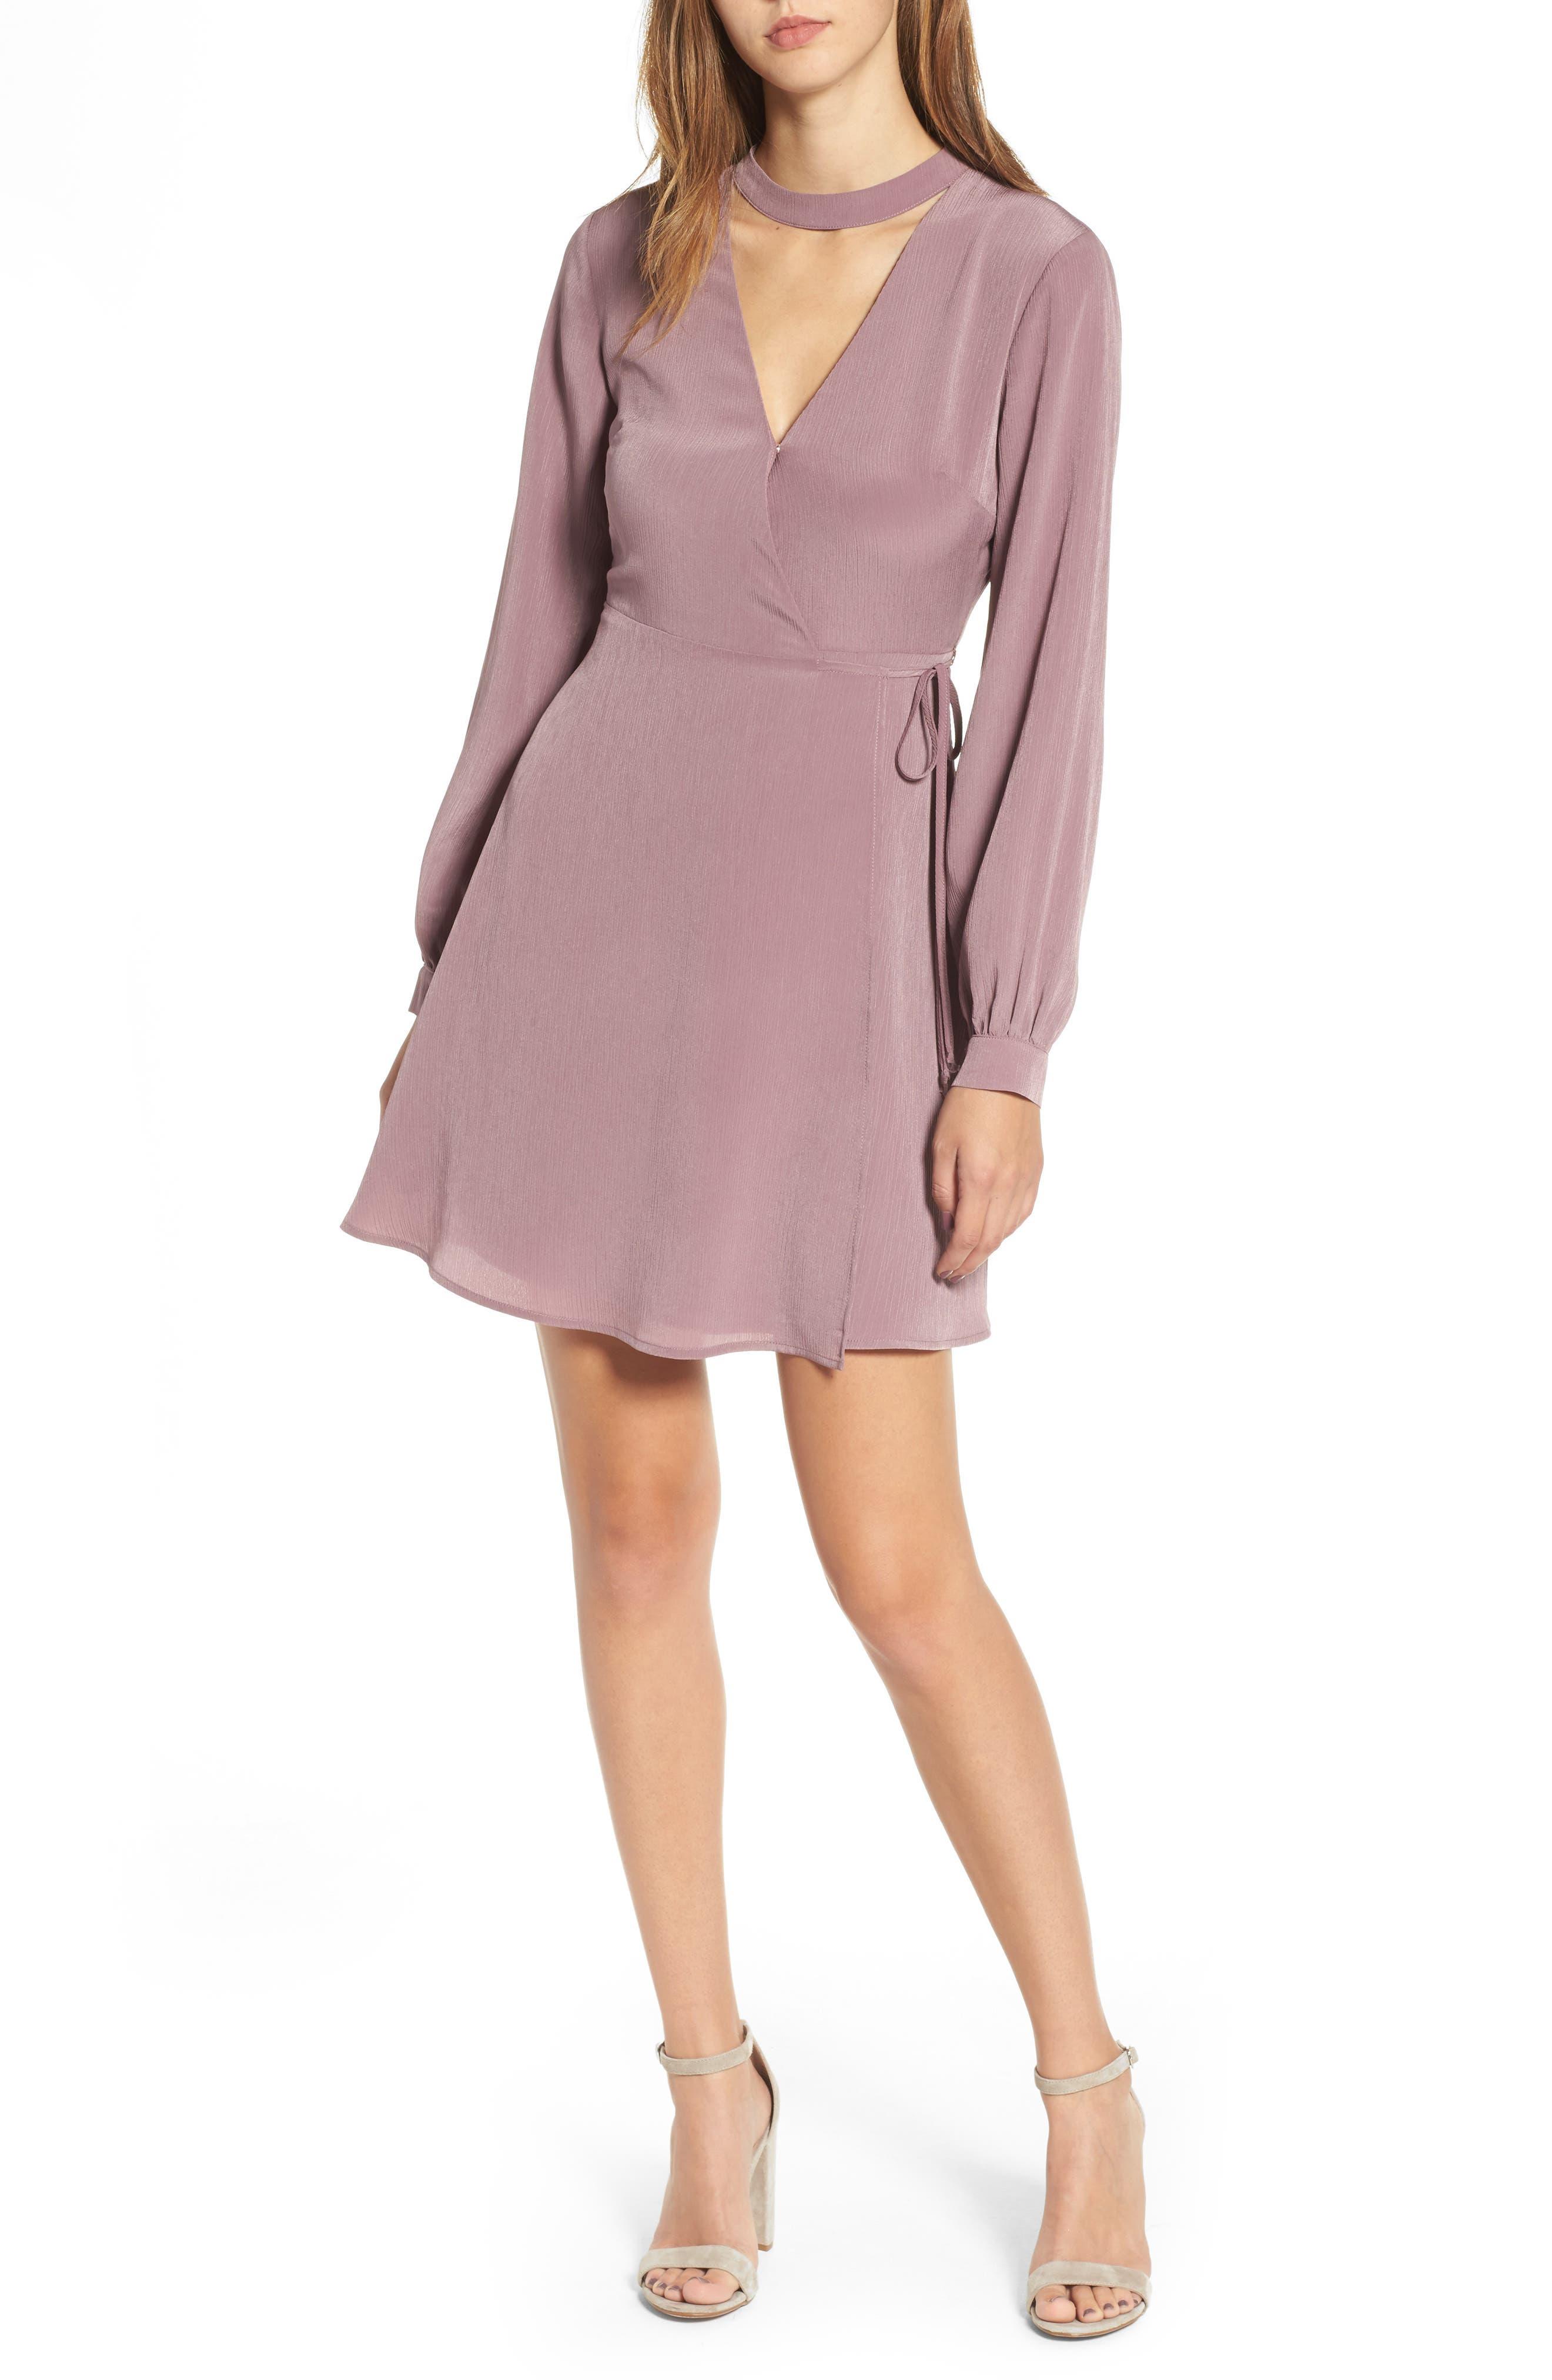 Alternate Image 1 Selected - Choker Neck Wrap Dress